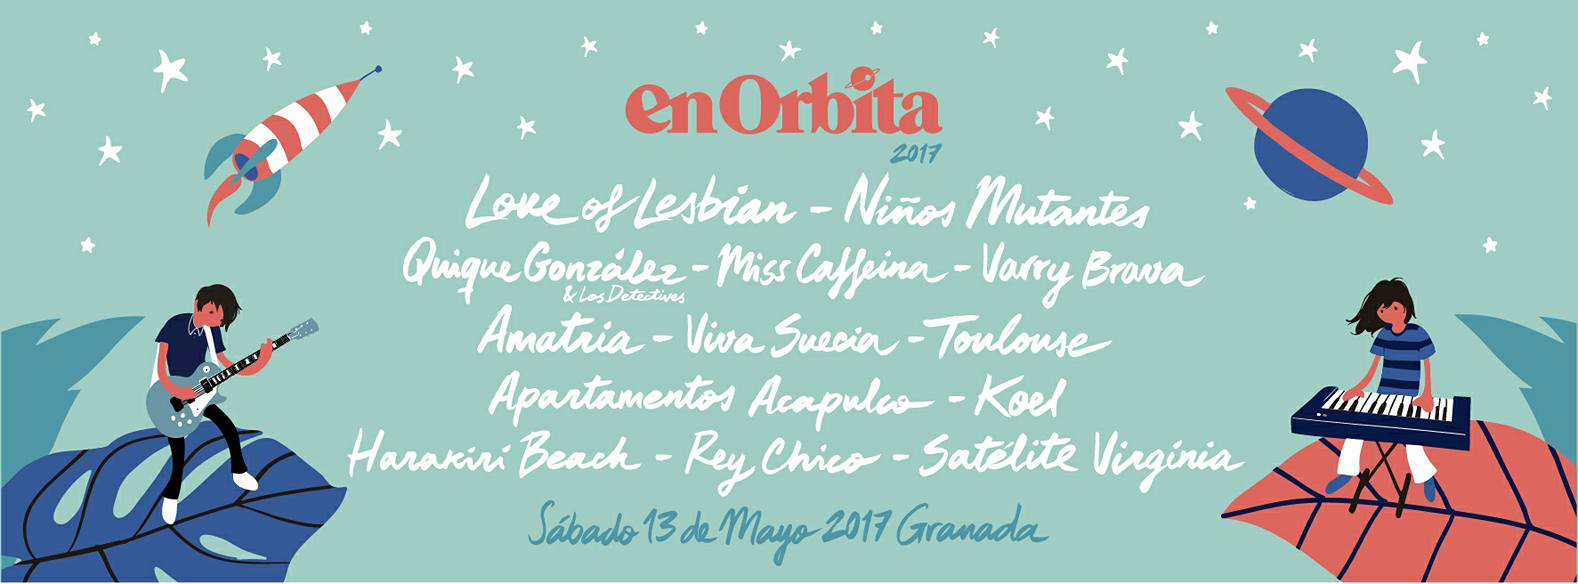 en orbita festival 2017